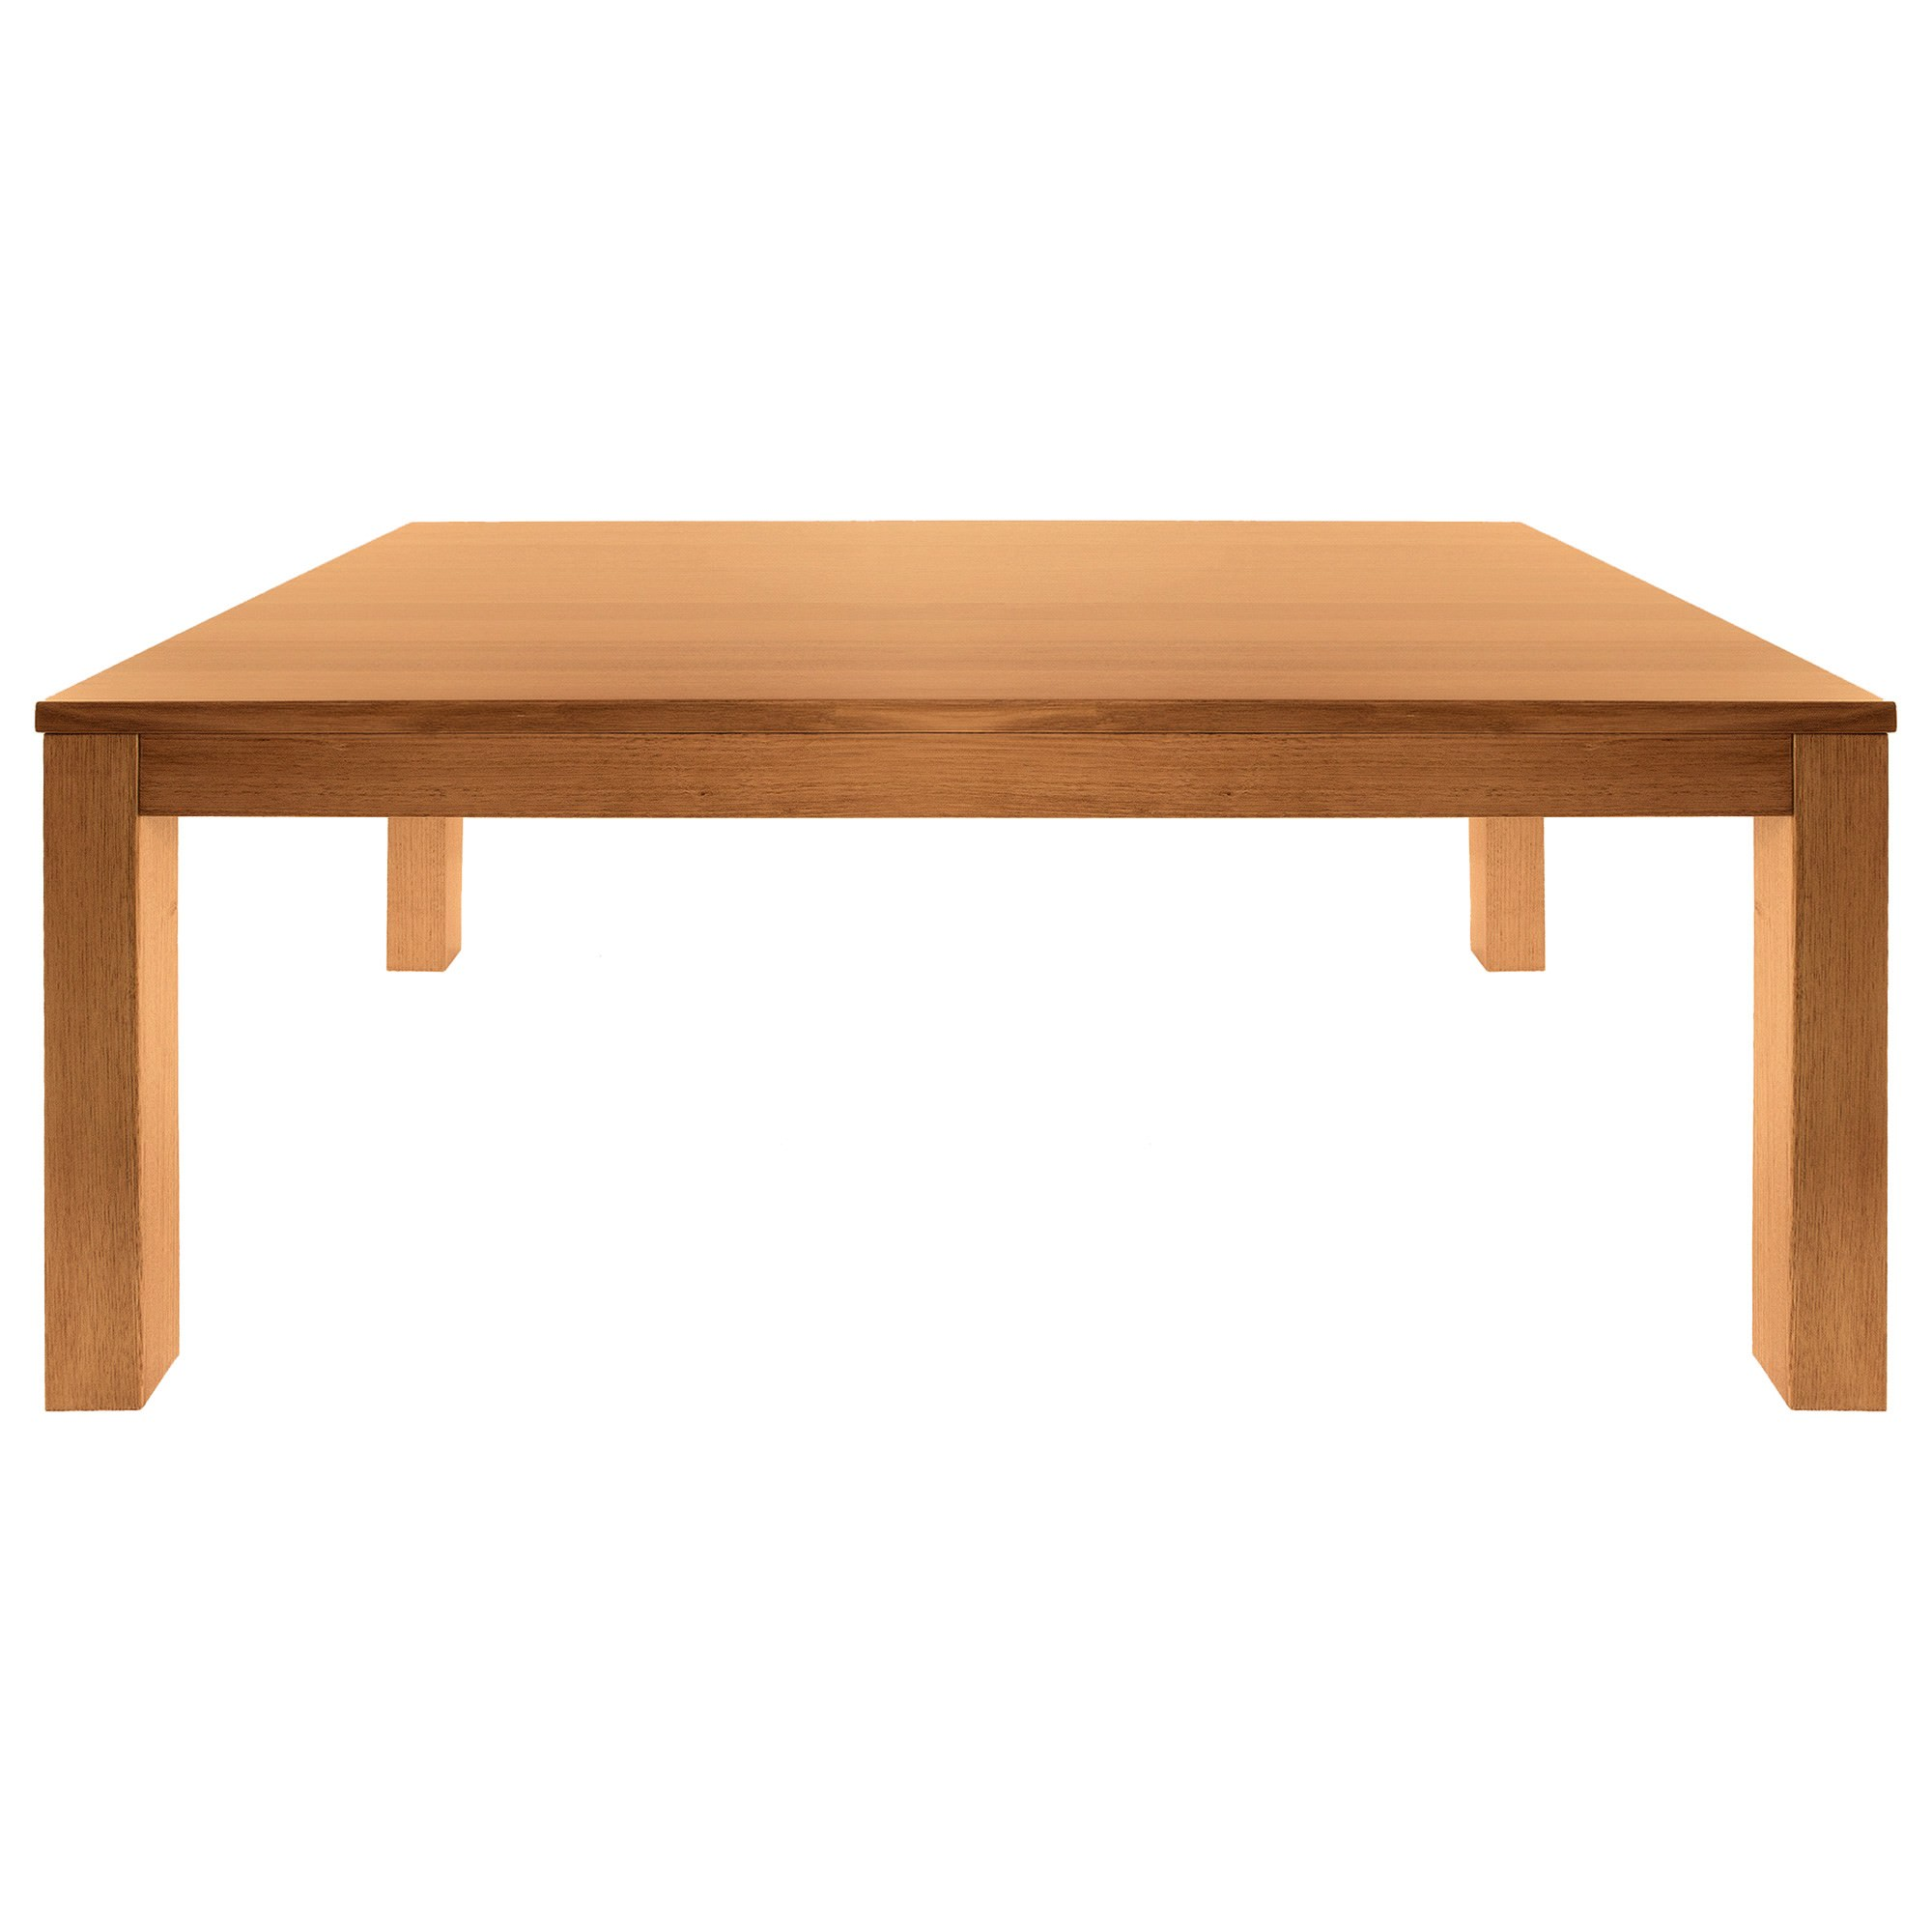 Moselia Tasmanian Oak Timber Dining Table, 210cm, Wheat